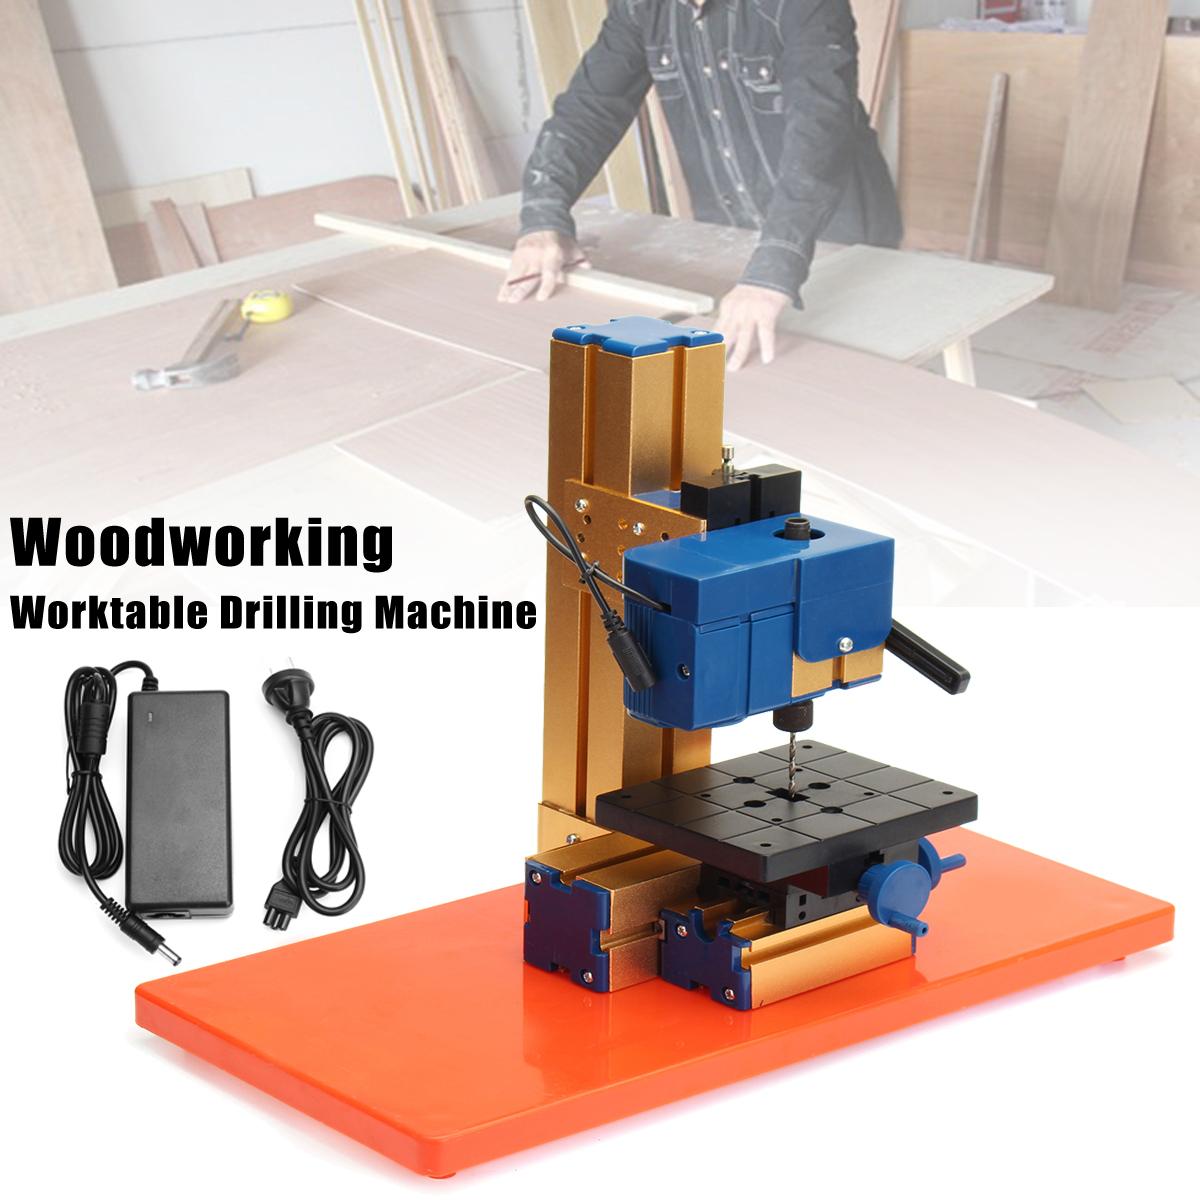 24W AC100-240V Mini Wood Lathe Wood Working Lathe Machine DIY Woodworking Tool for Hobby